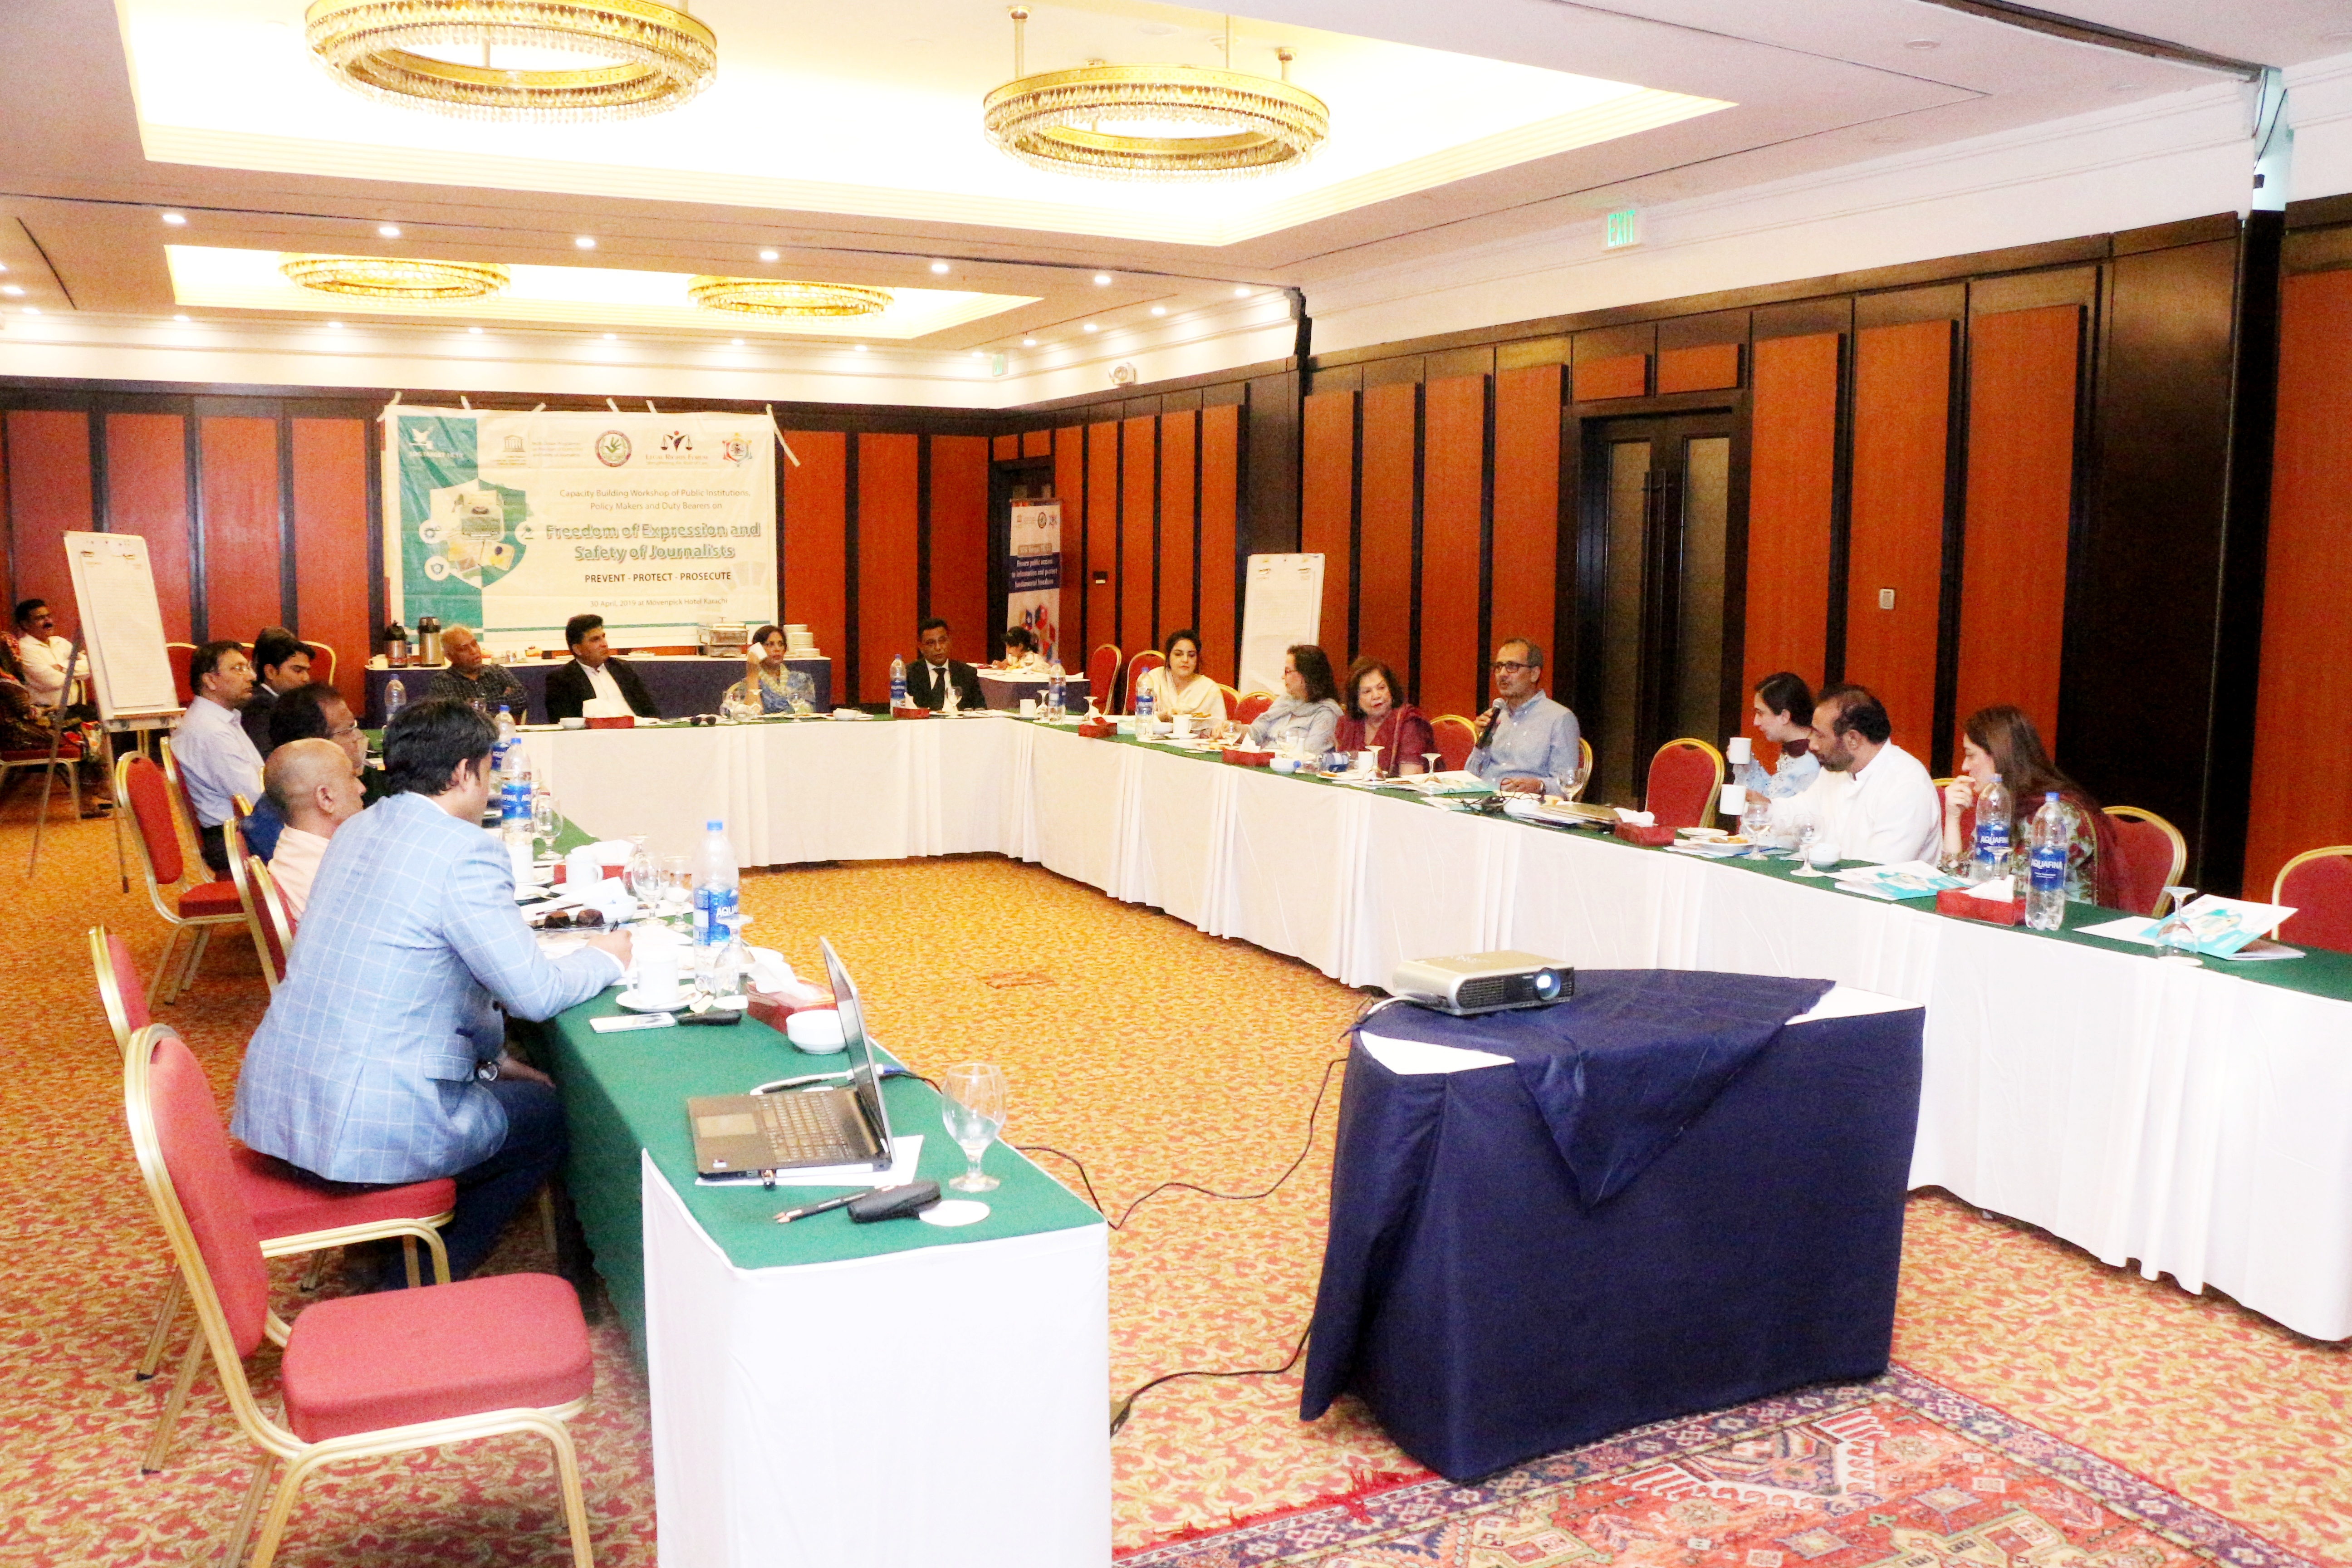 UNESCO Capacity Building Training Safety of Journalist Karachi